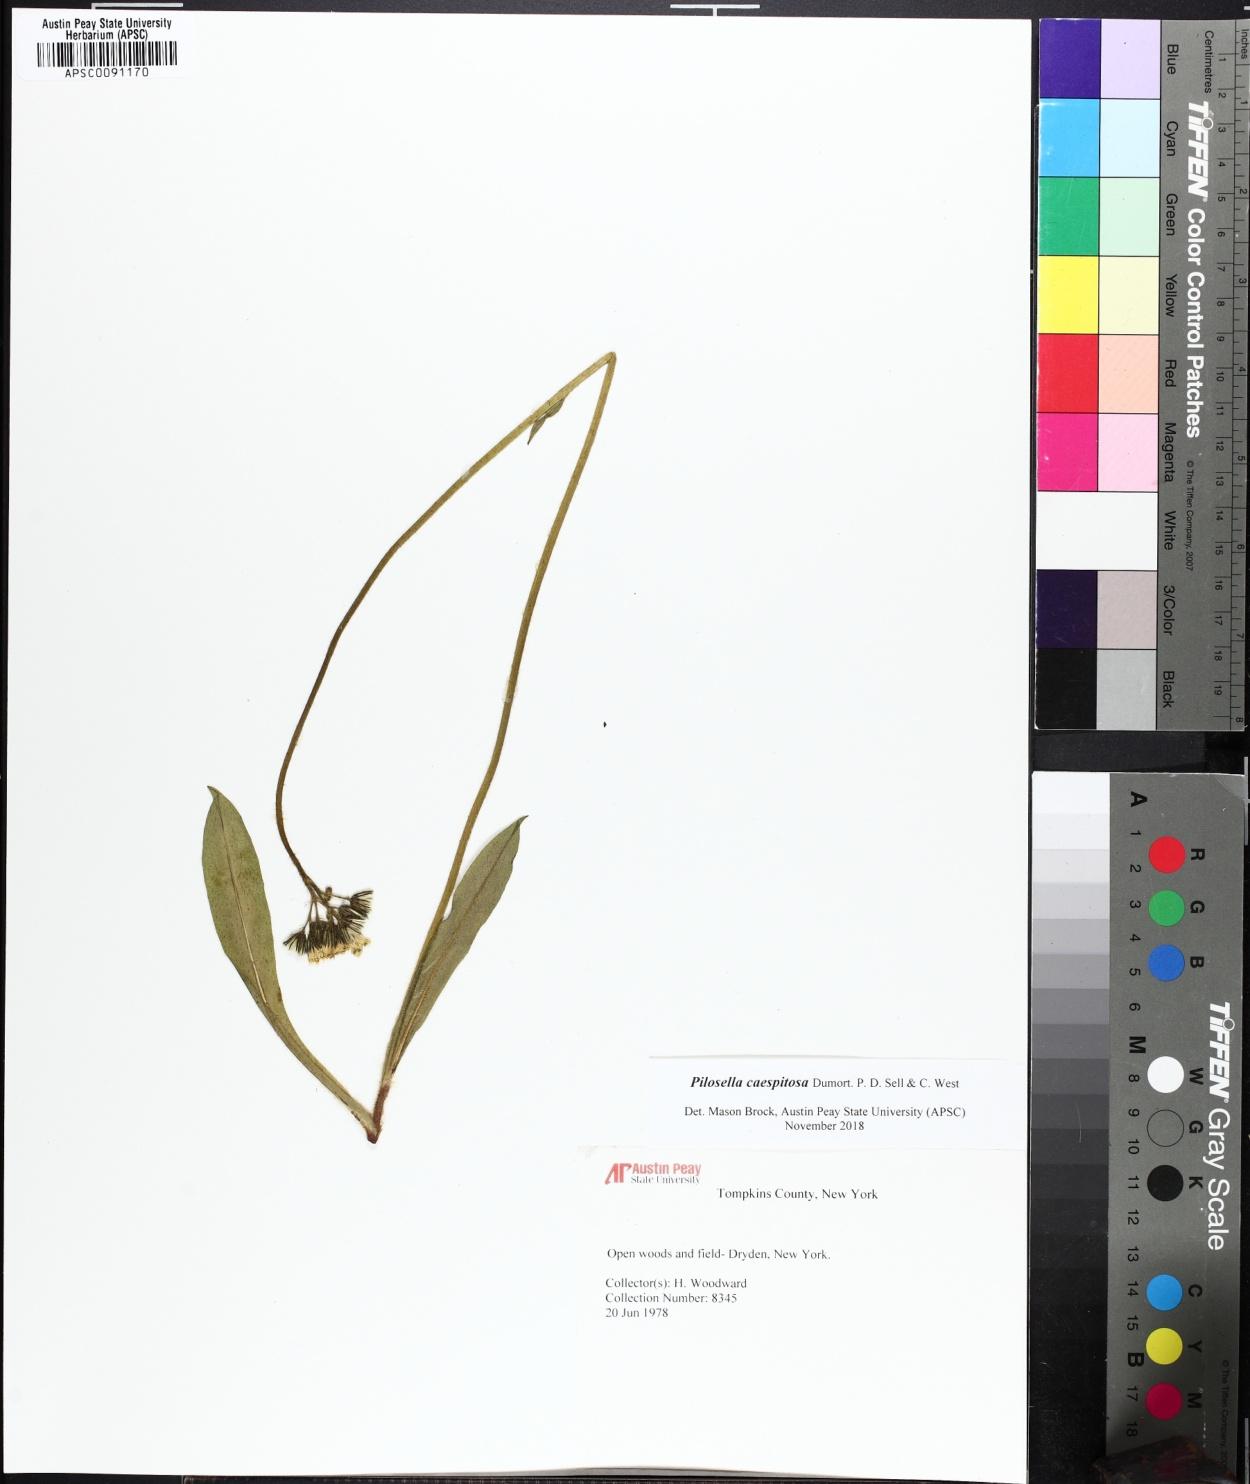 Pilosella caespitosa image